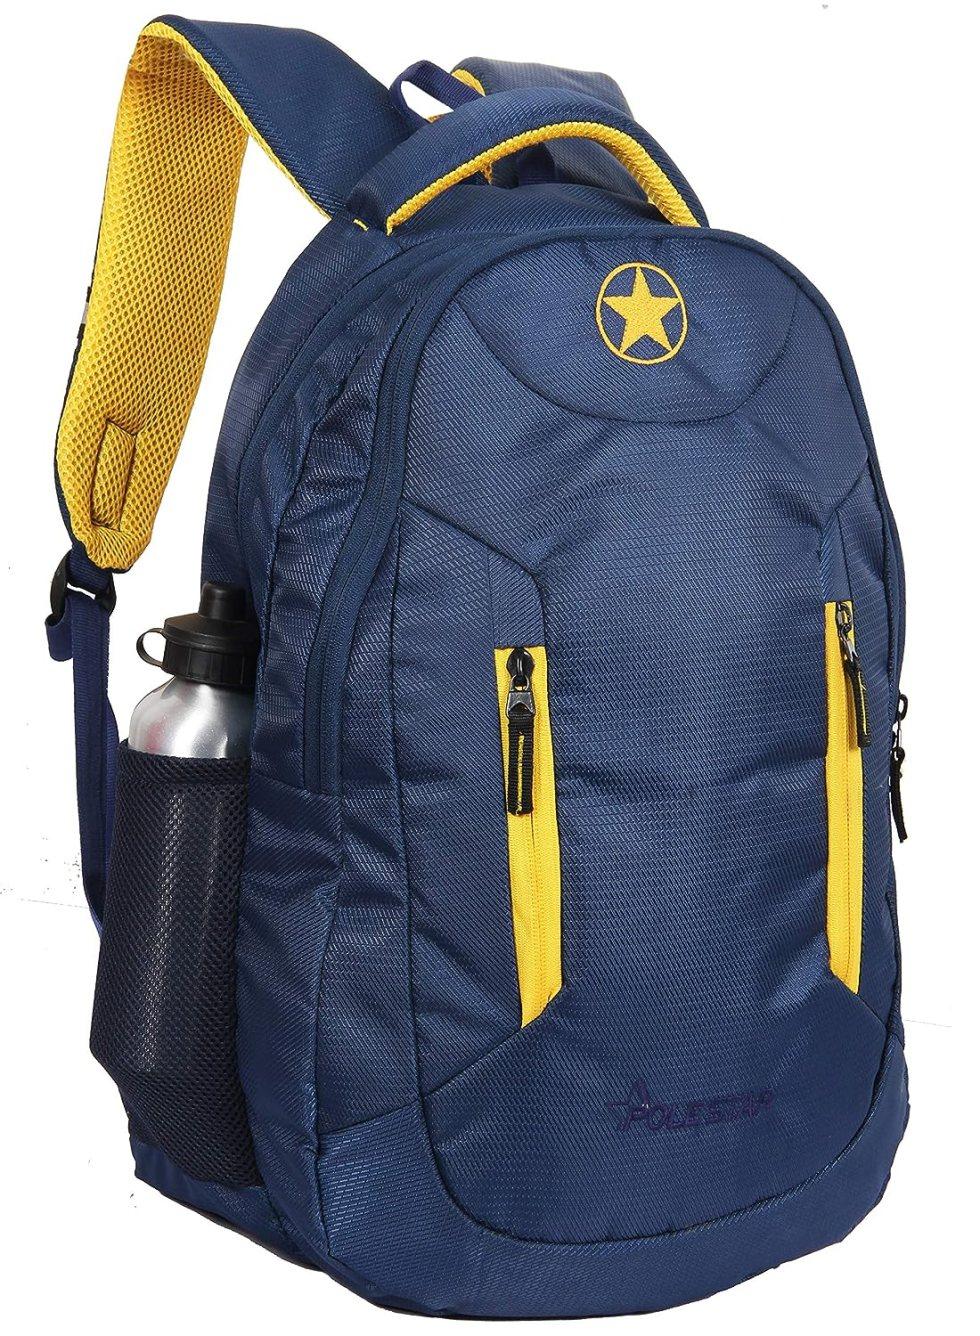 Grand Navy 38 LTR Laptop Travel Backpack/Casual School bag pack under Polestar Travel Bag